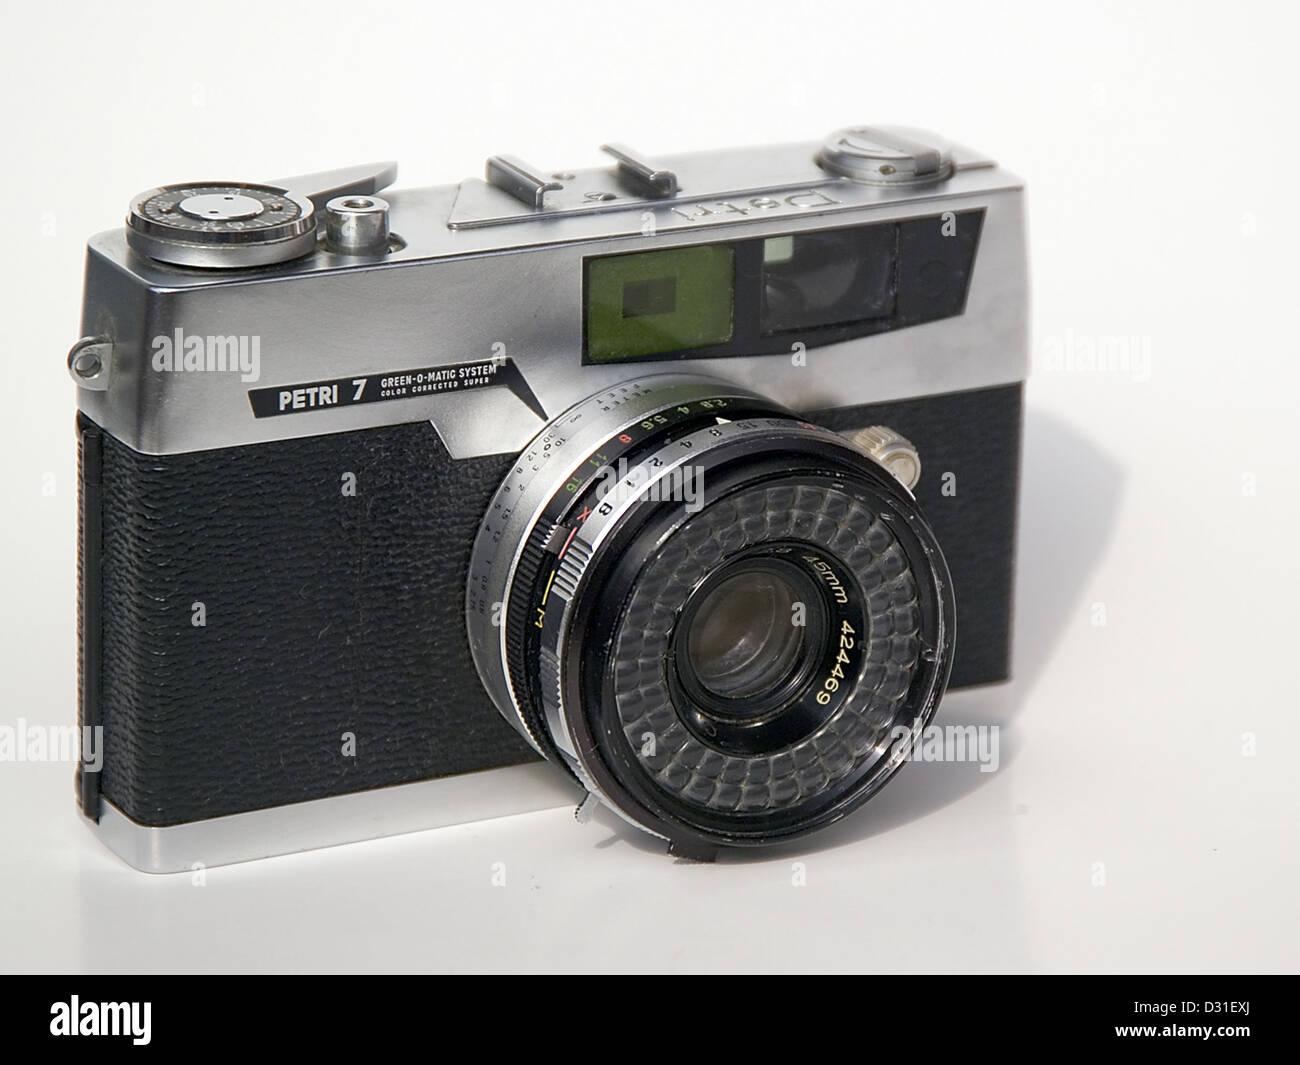 Petri 7 rangefinder camera - Stock Image